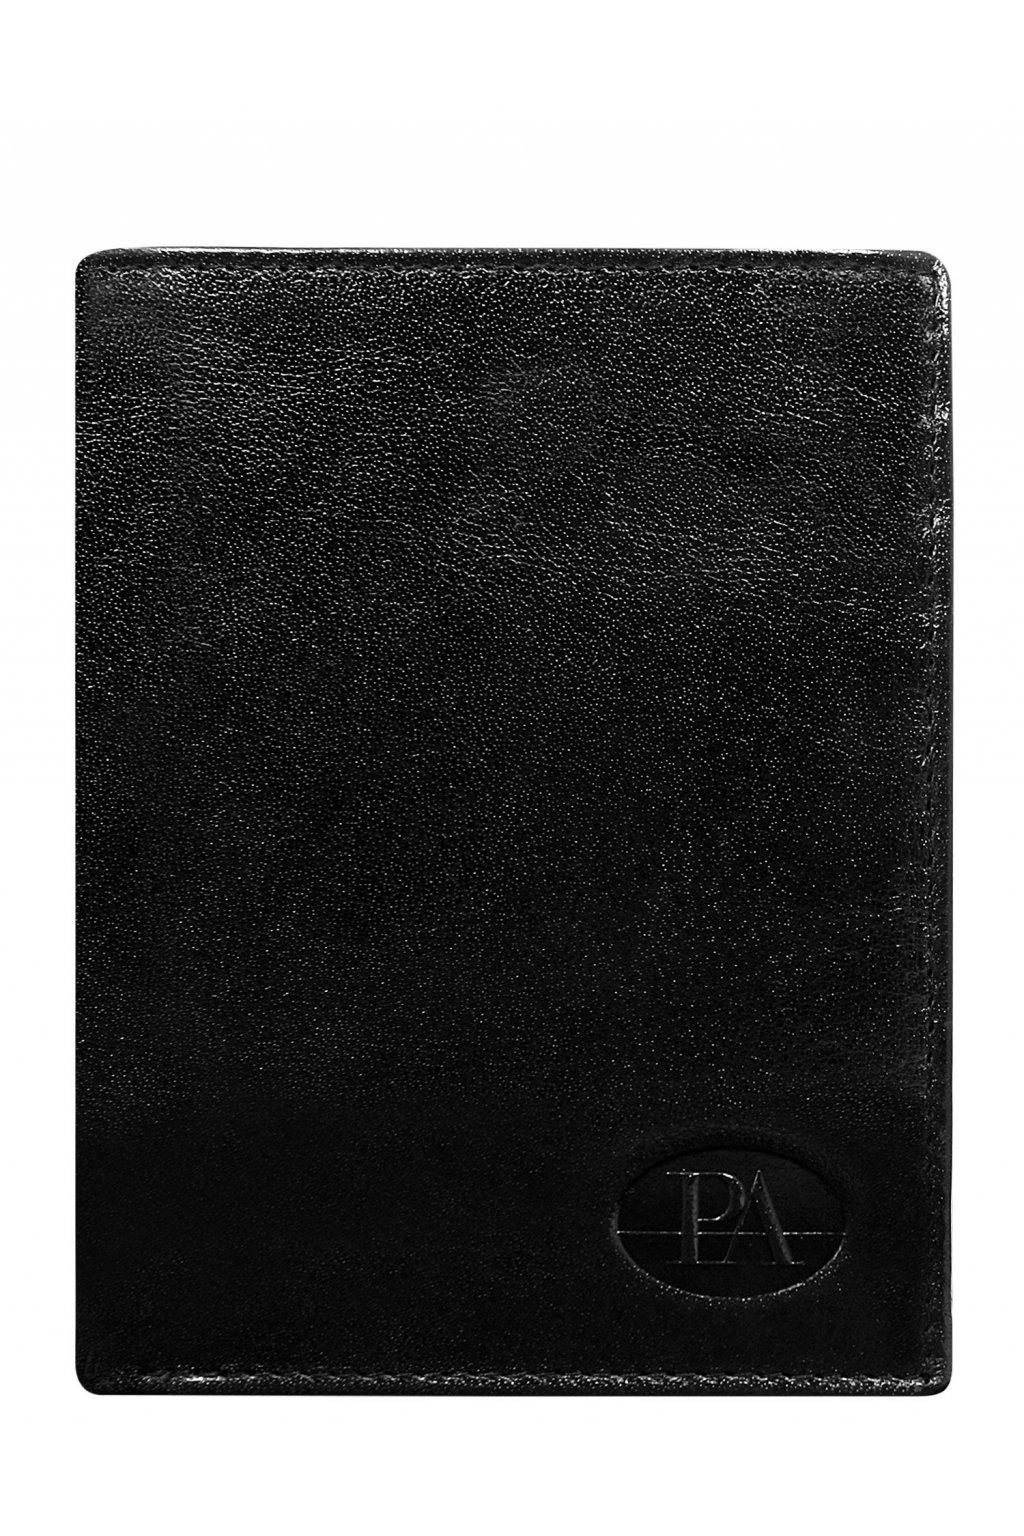 Pánska peňaženka kód CE-PR-PW-007-BTU.32